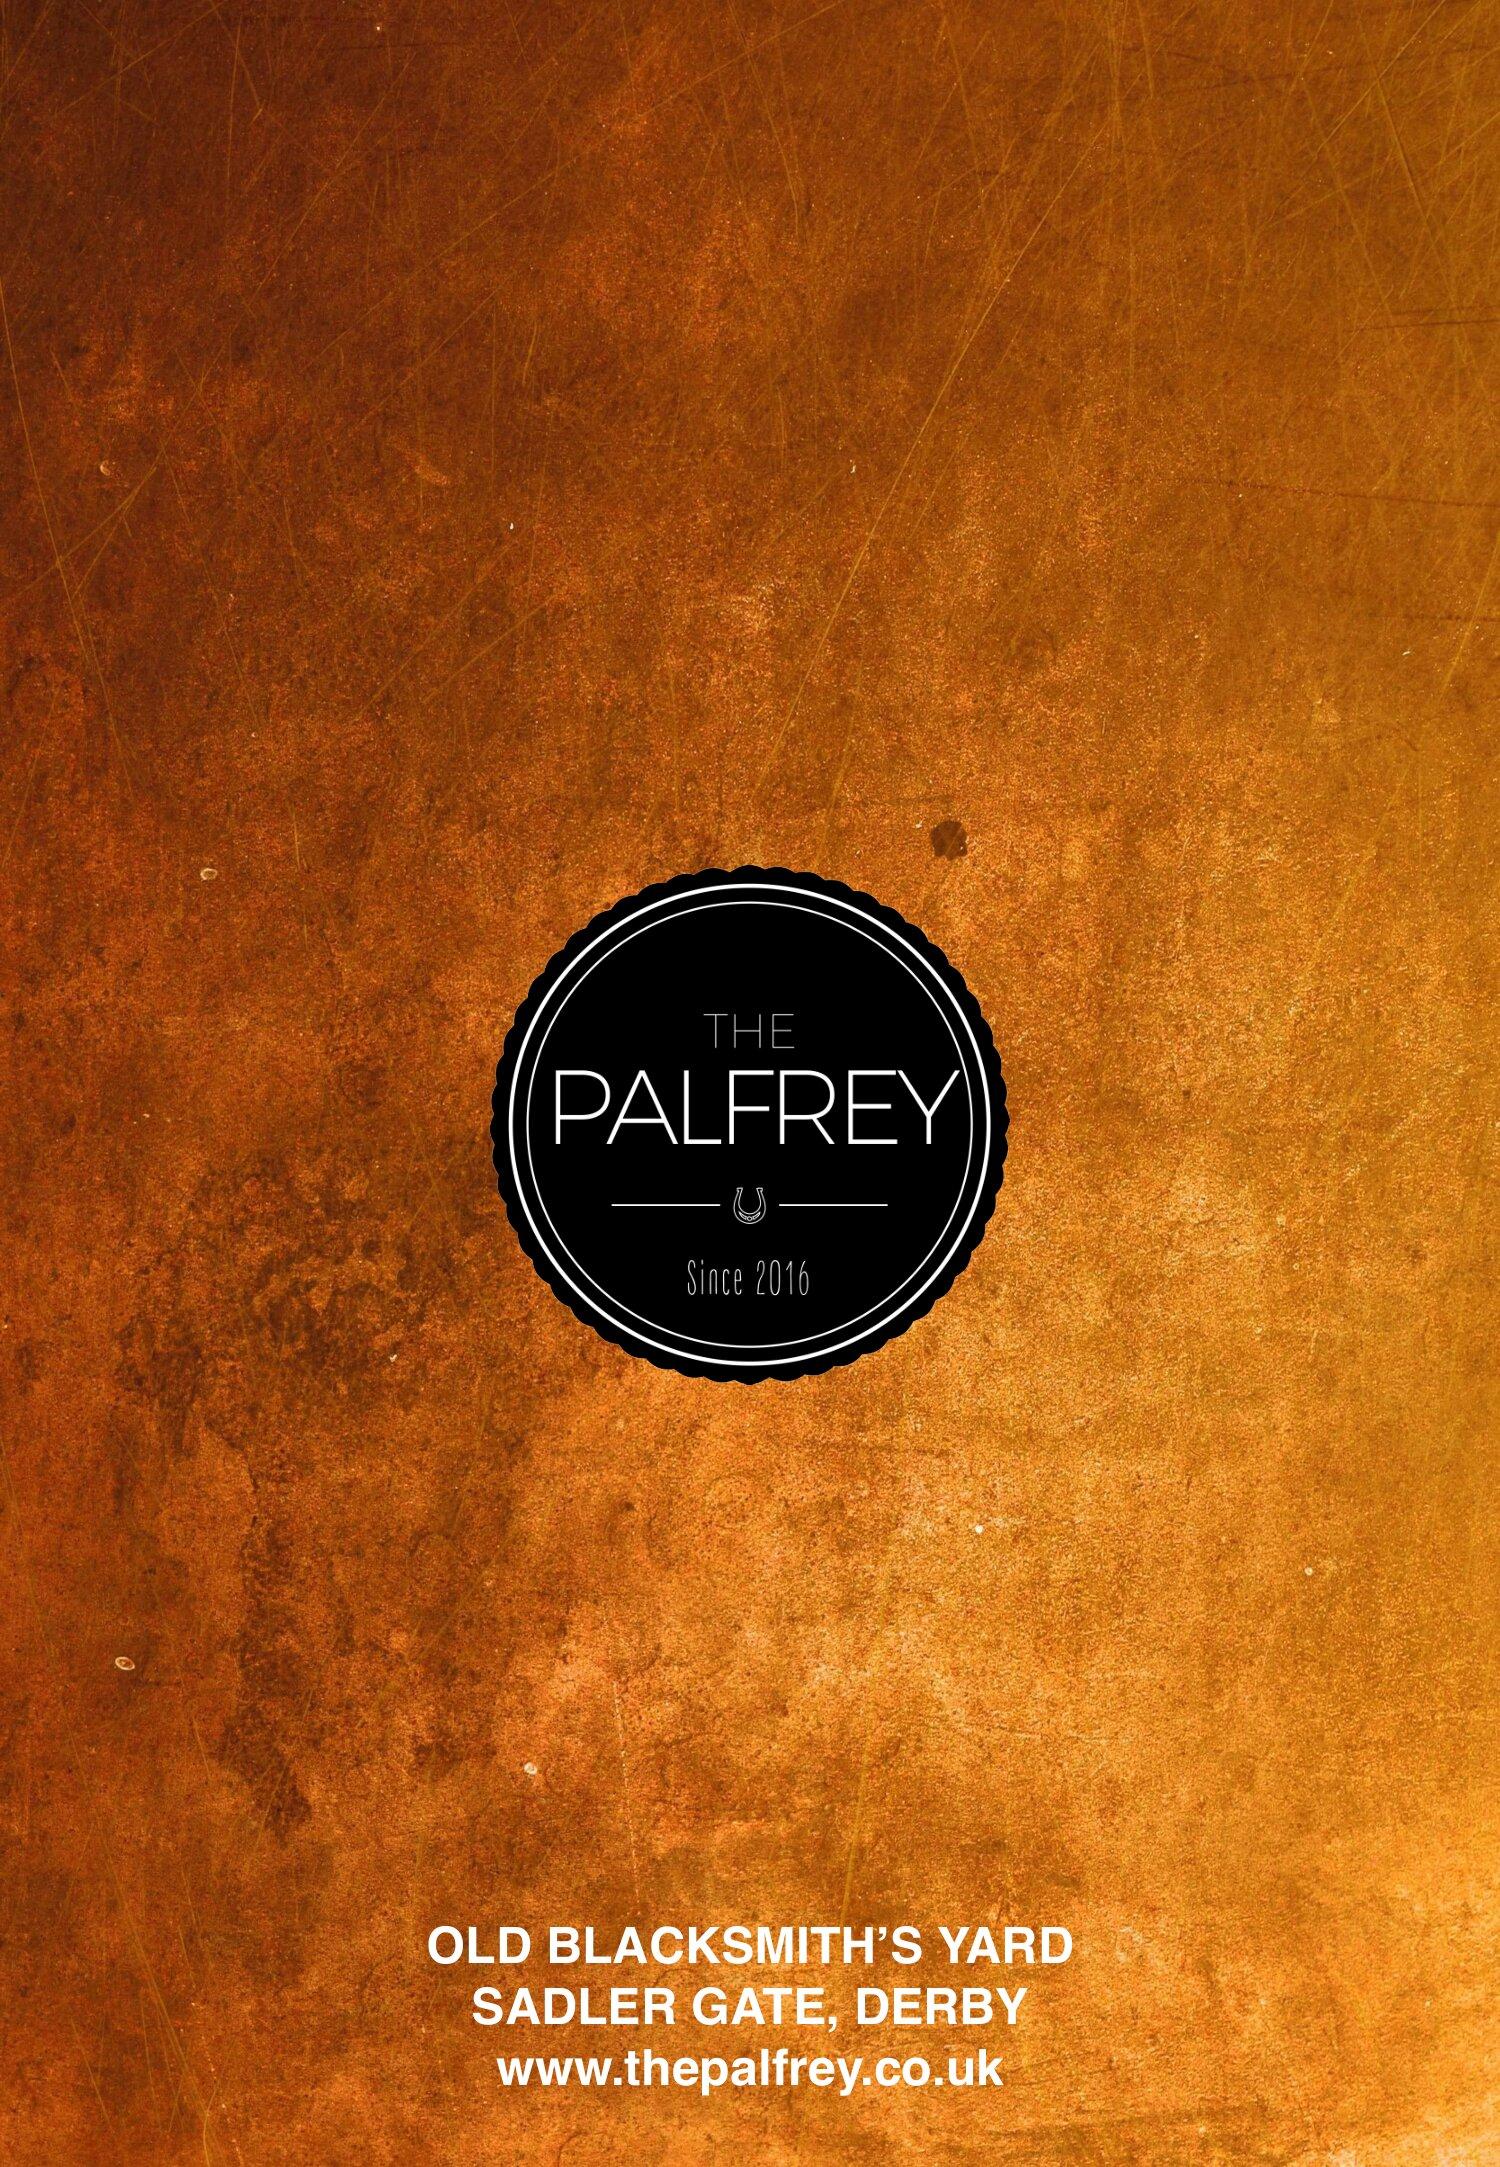 Palfrey sunday menu august 2020_2-end